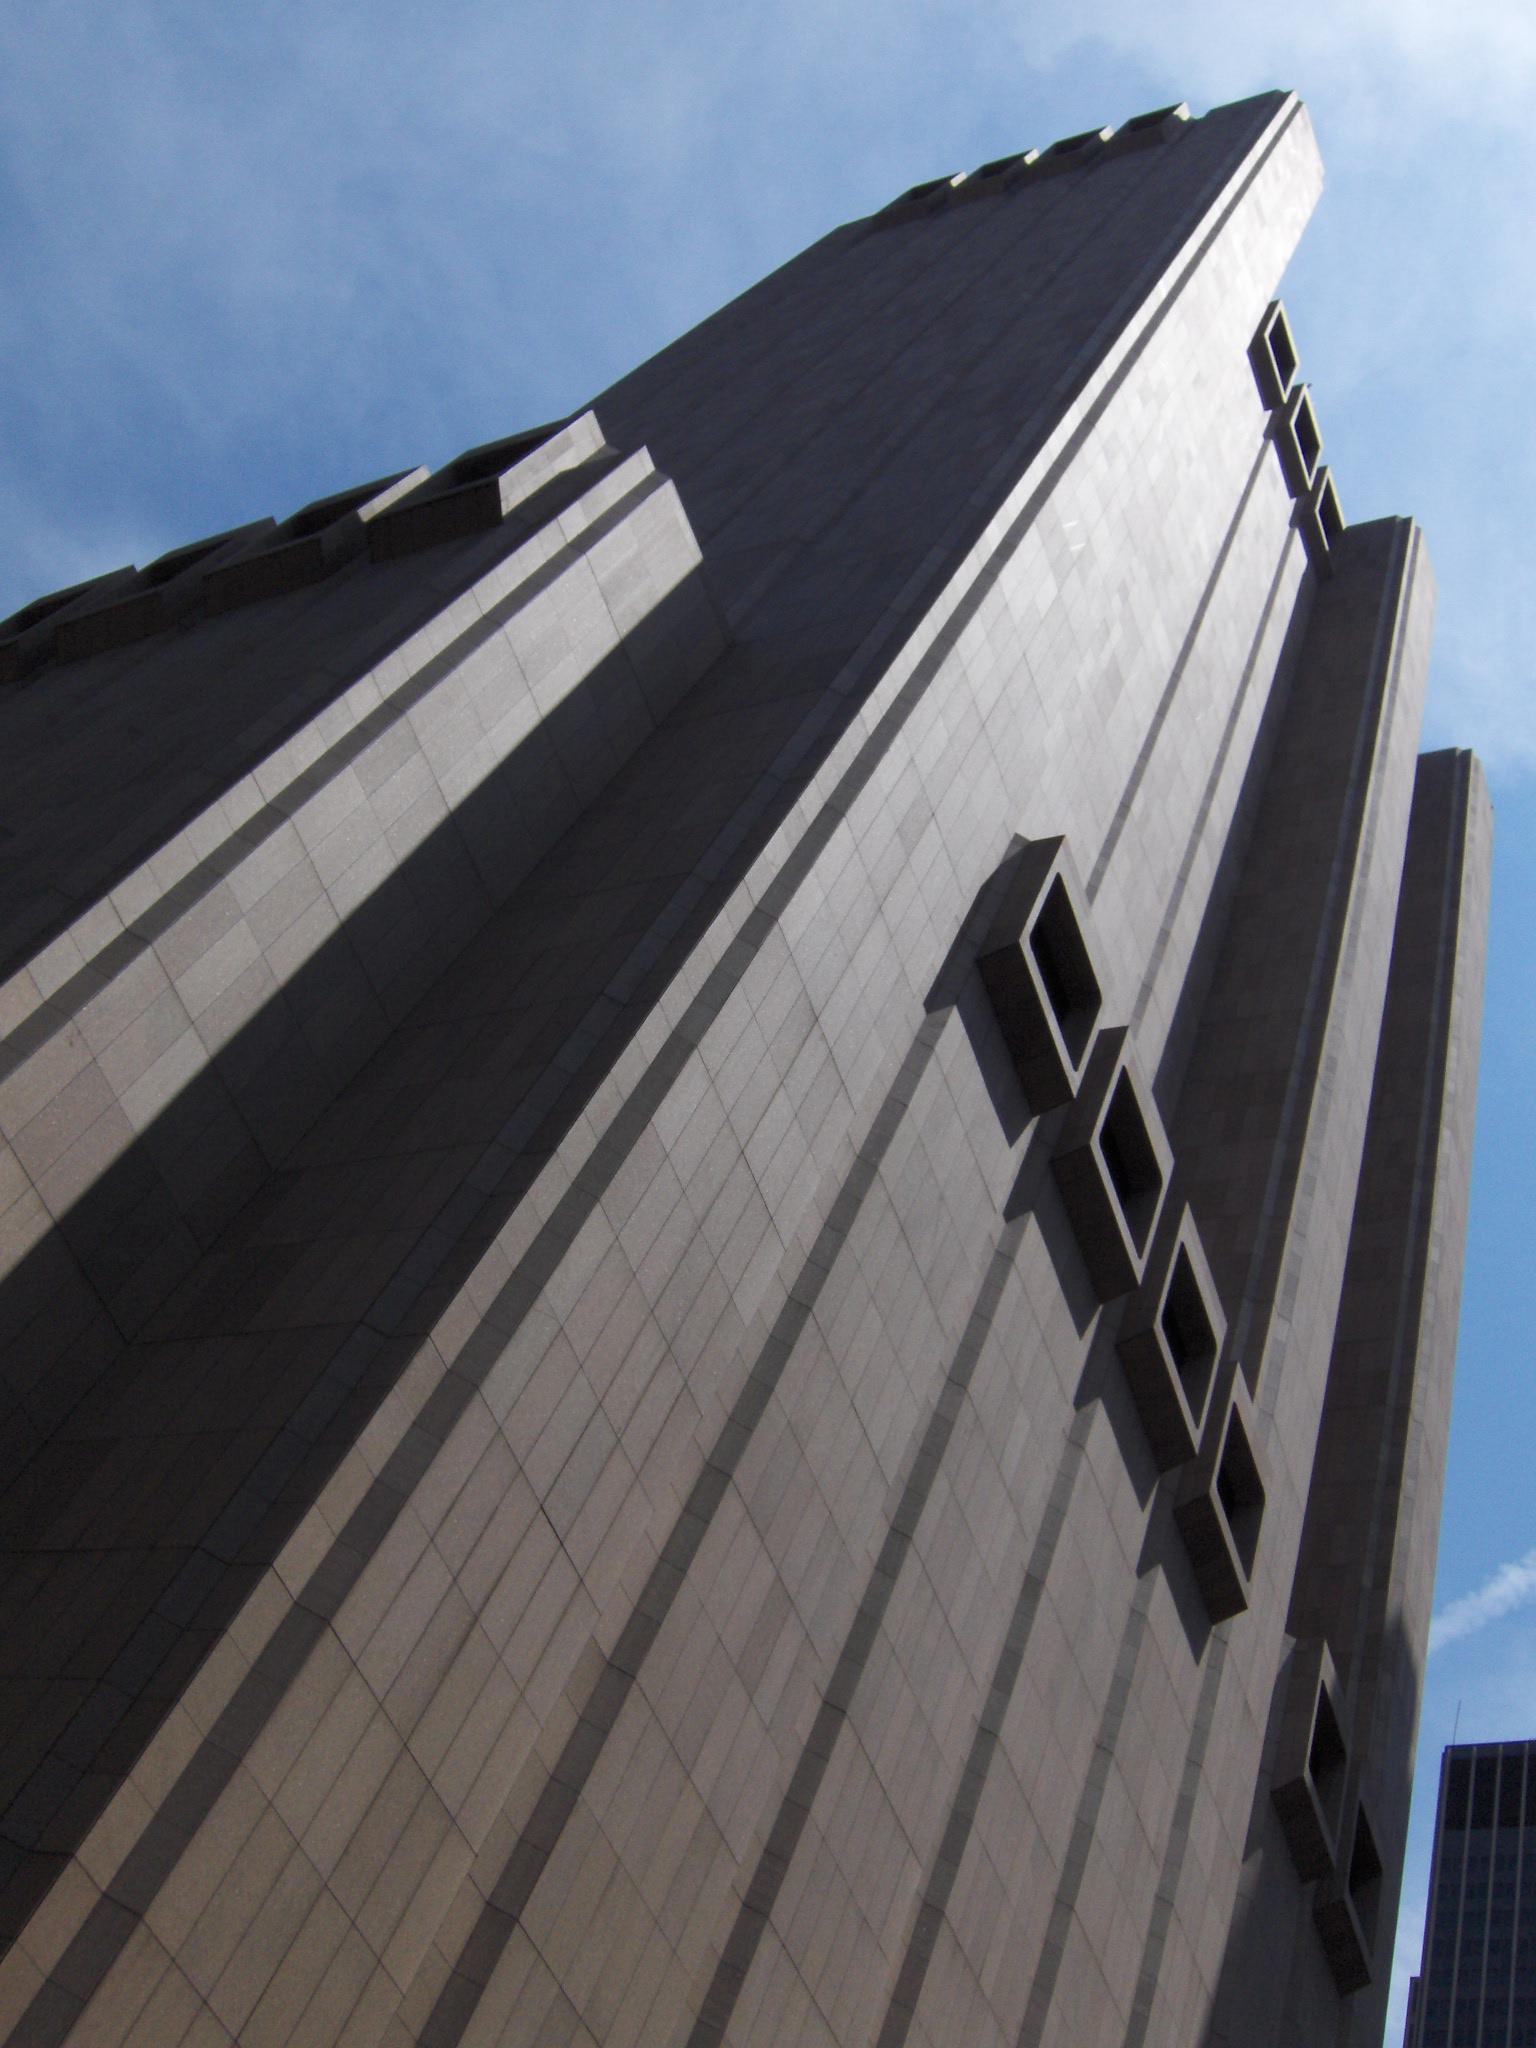 NSA secret skyscraper New York